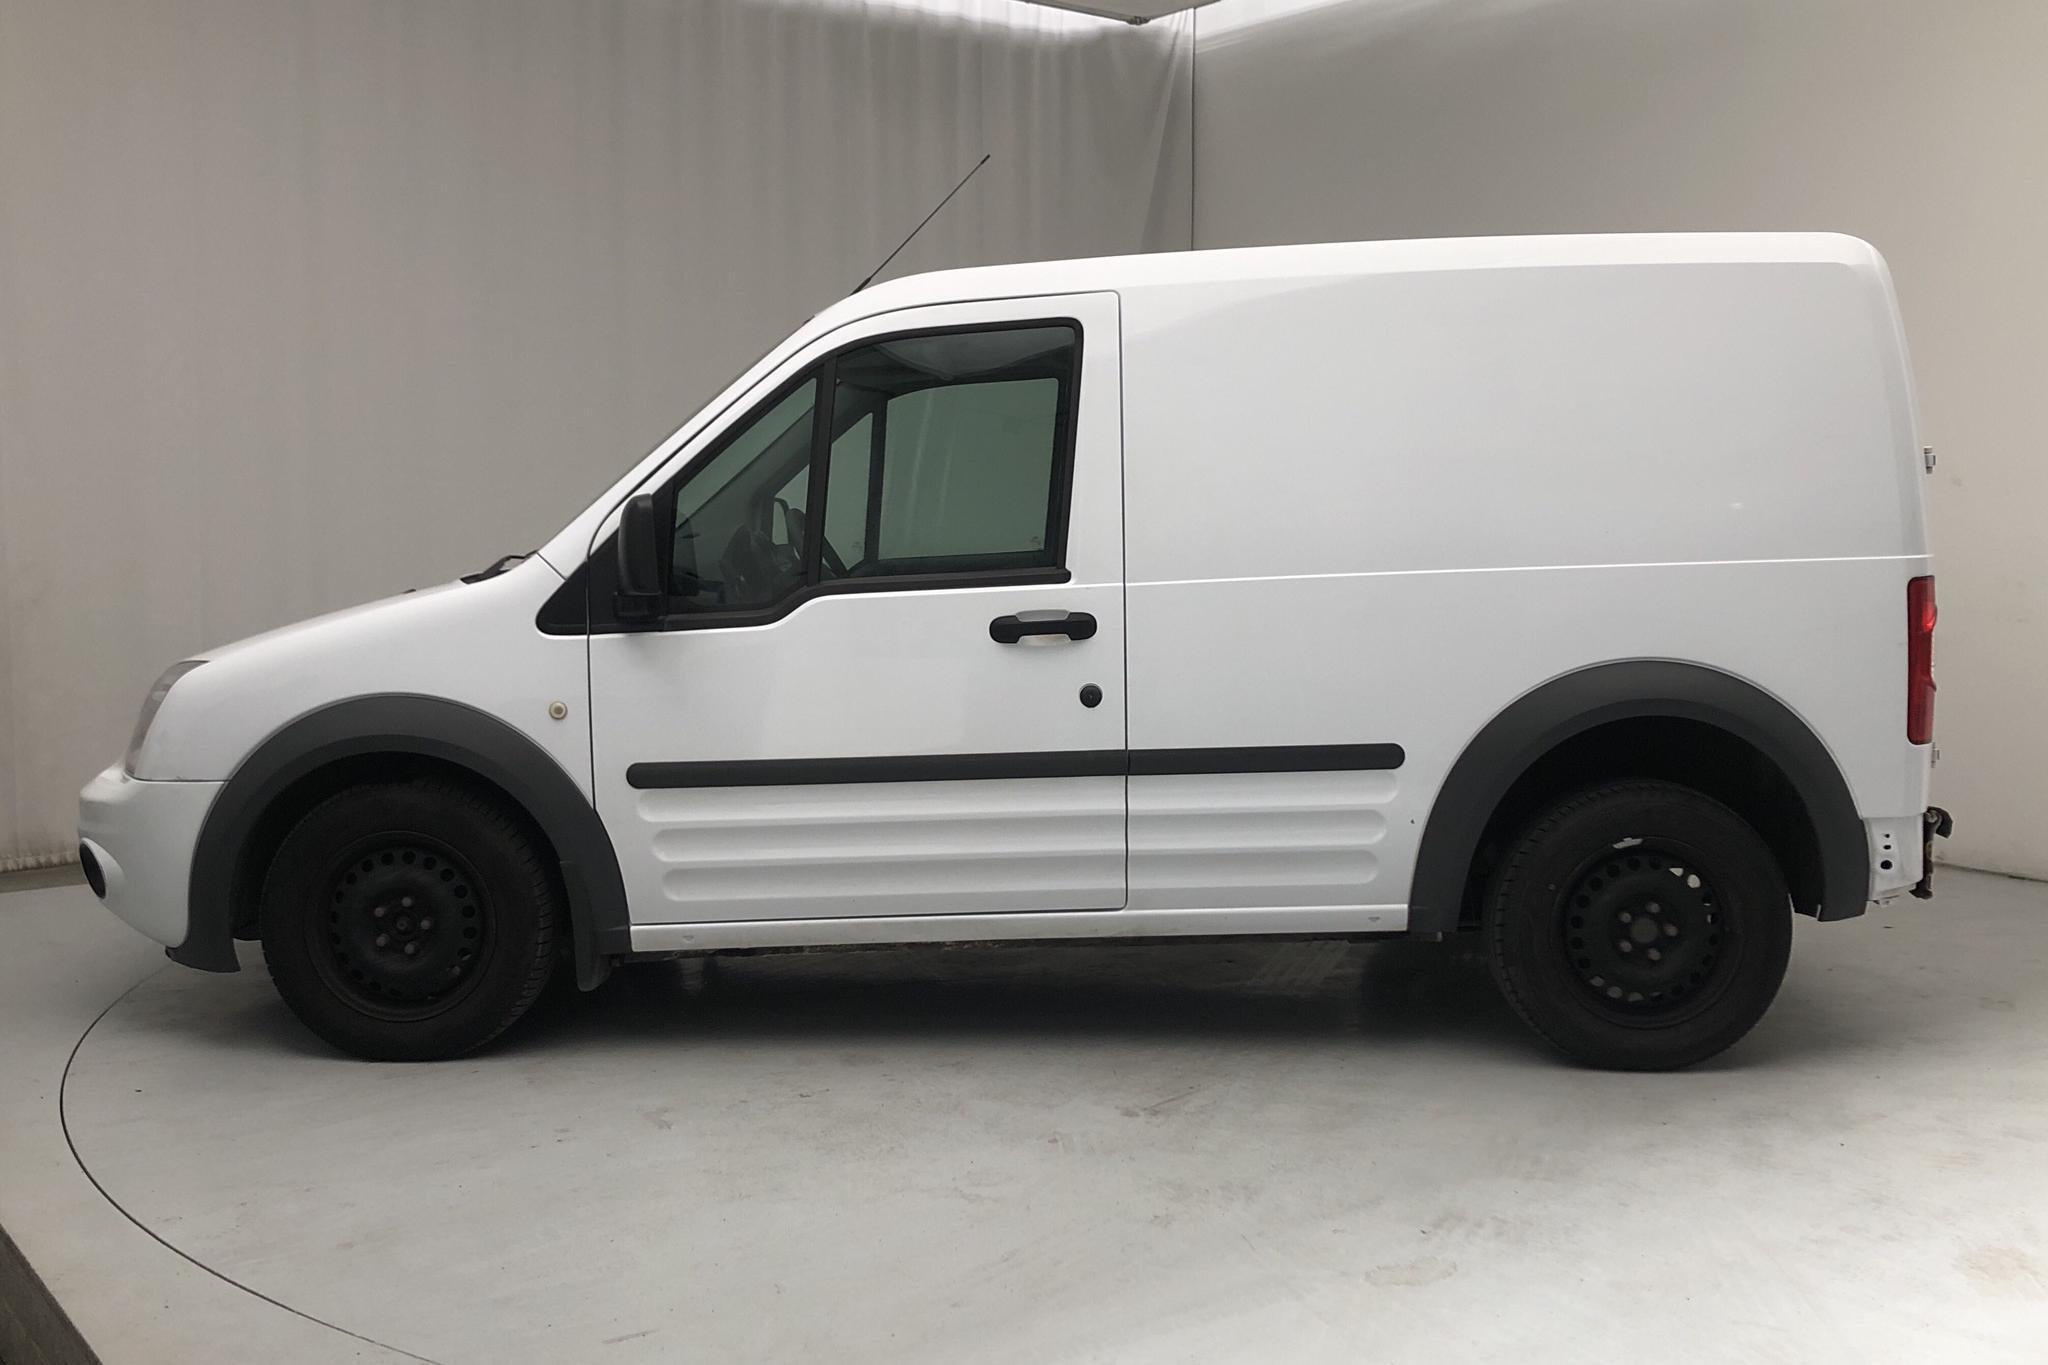 Ford Transit Connect 1.8 TDCi (90hk) - 6 229 mil - Manuell - vit - 2010